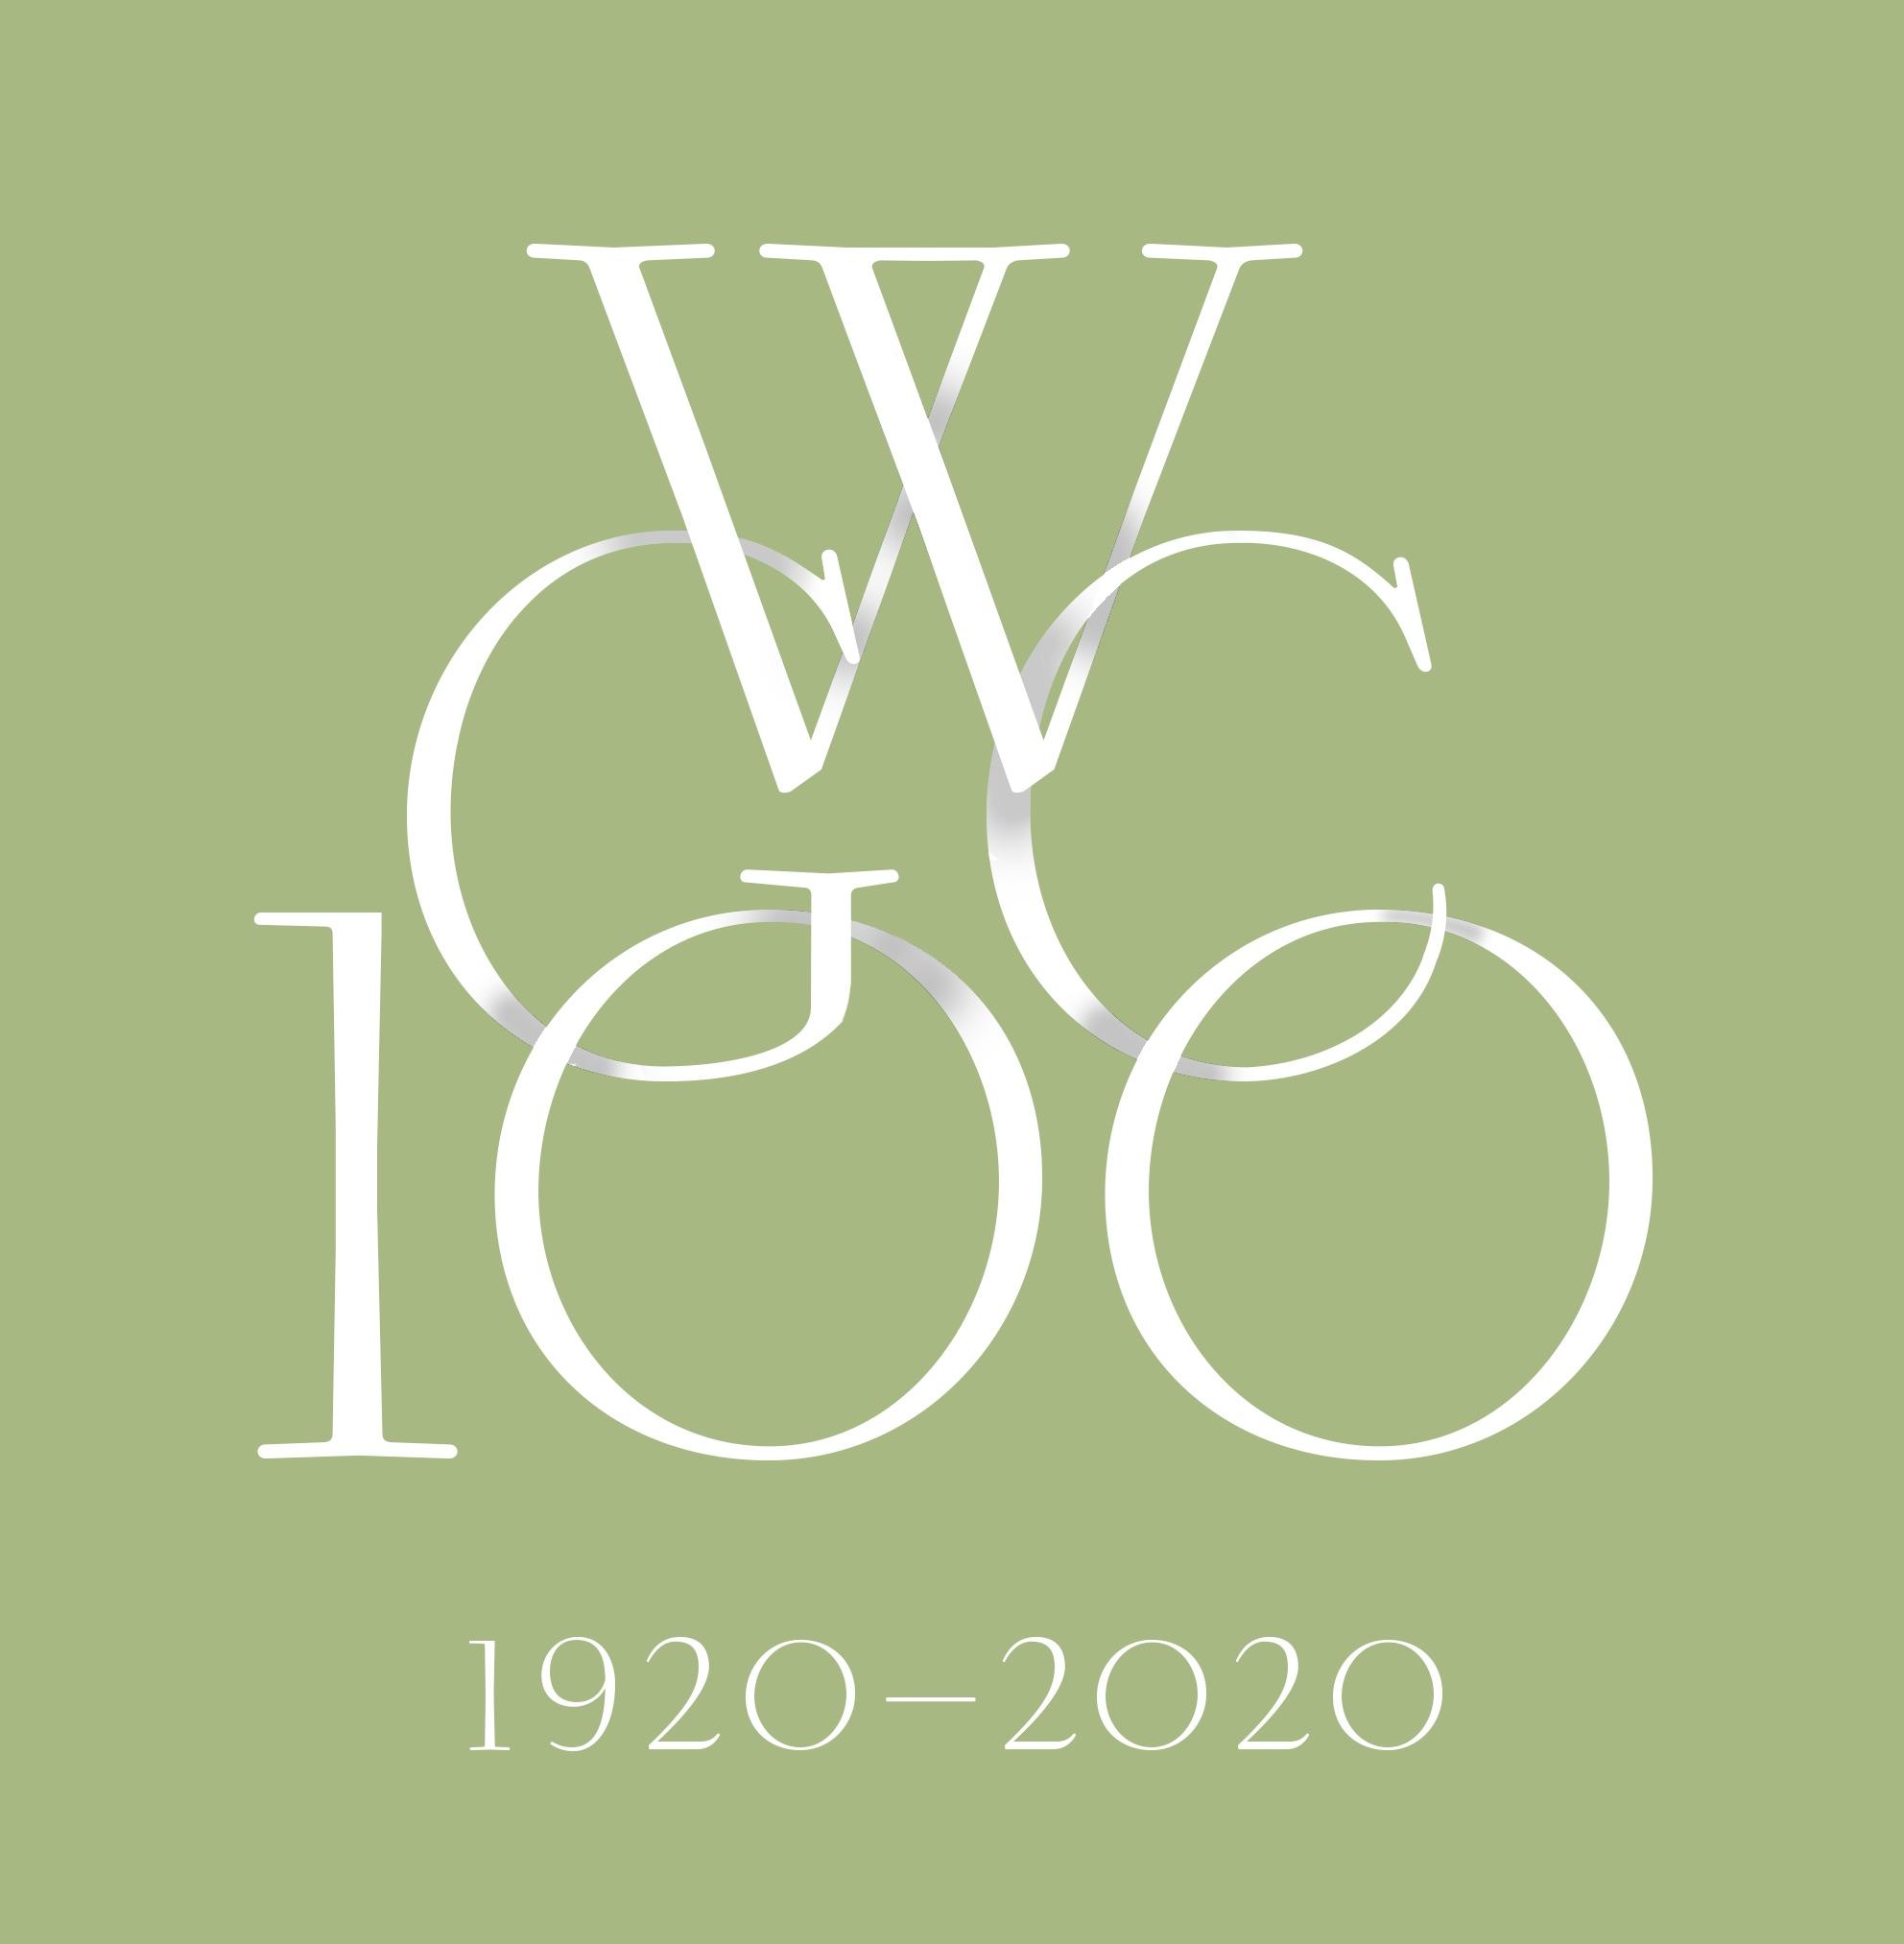 Community Exhibition: Post War Welwyn Garden City